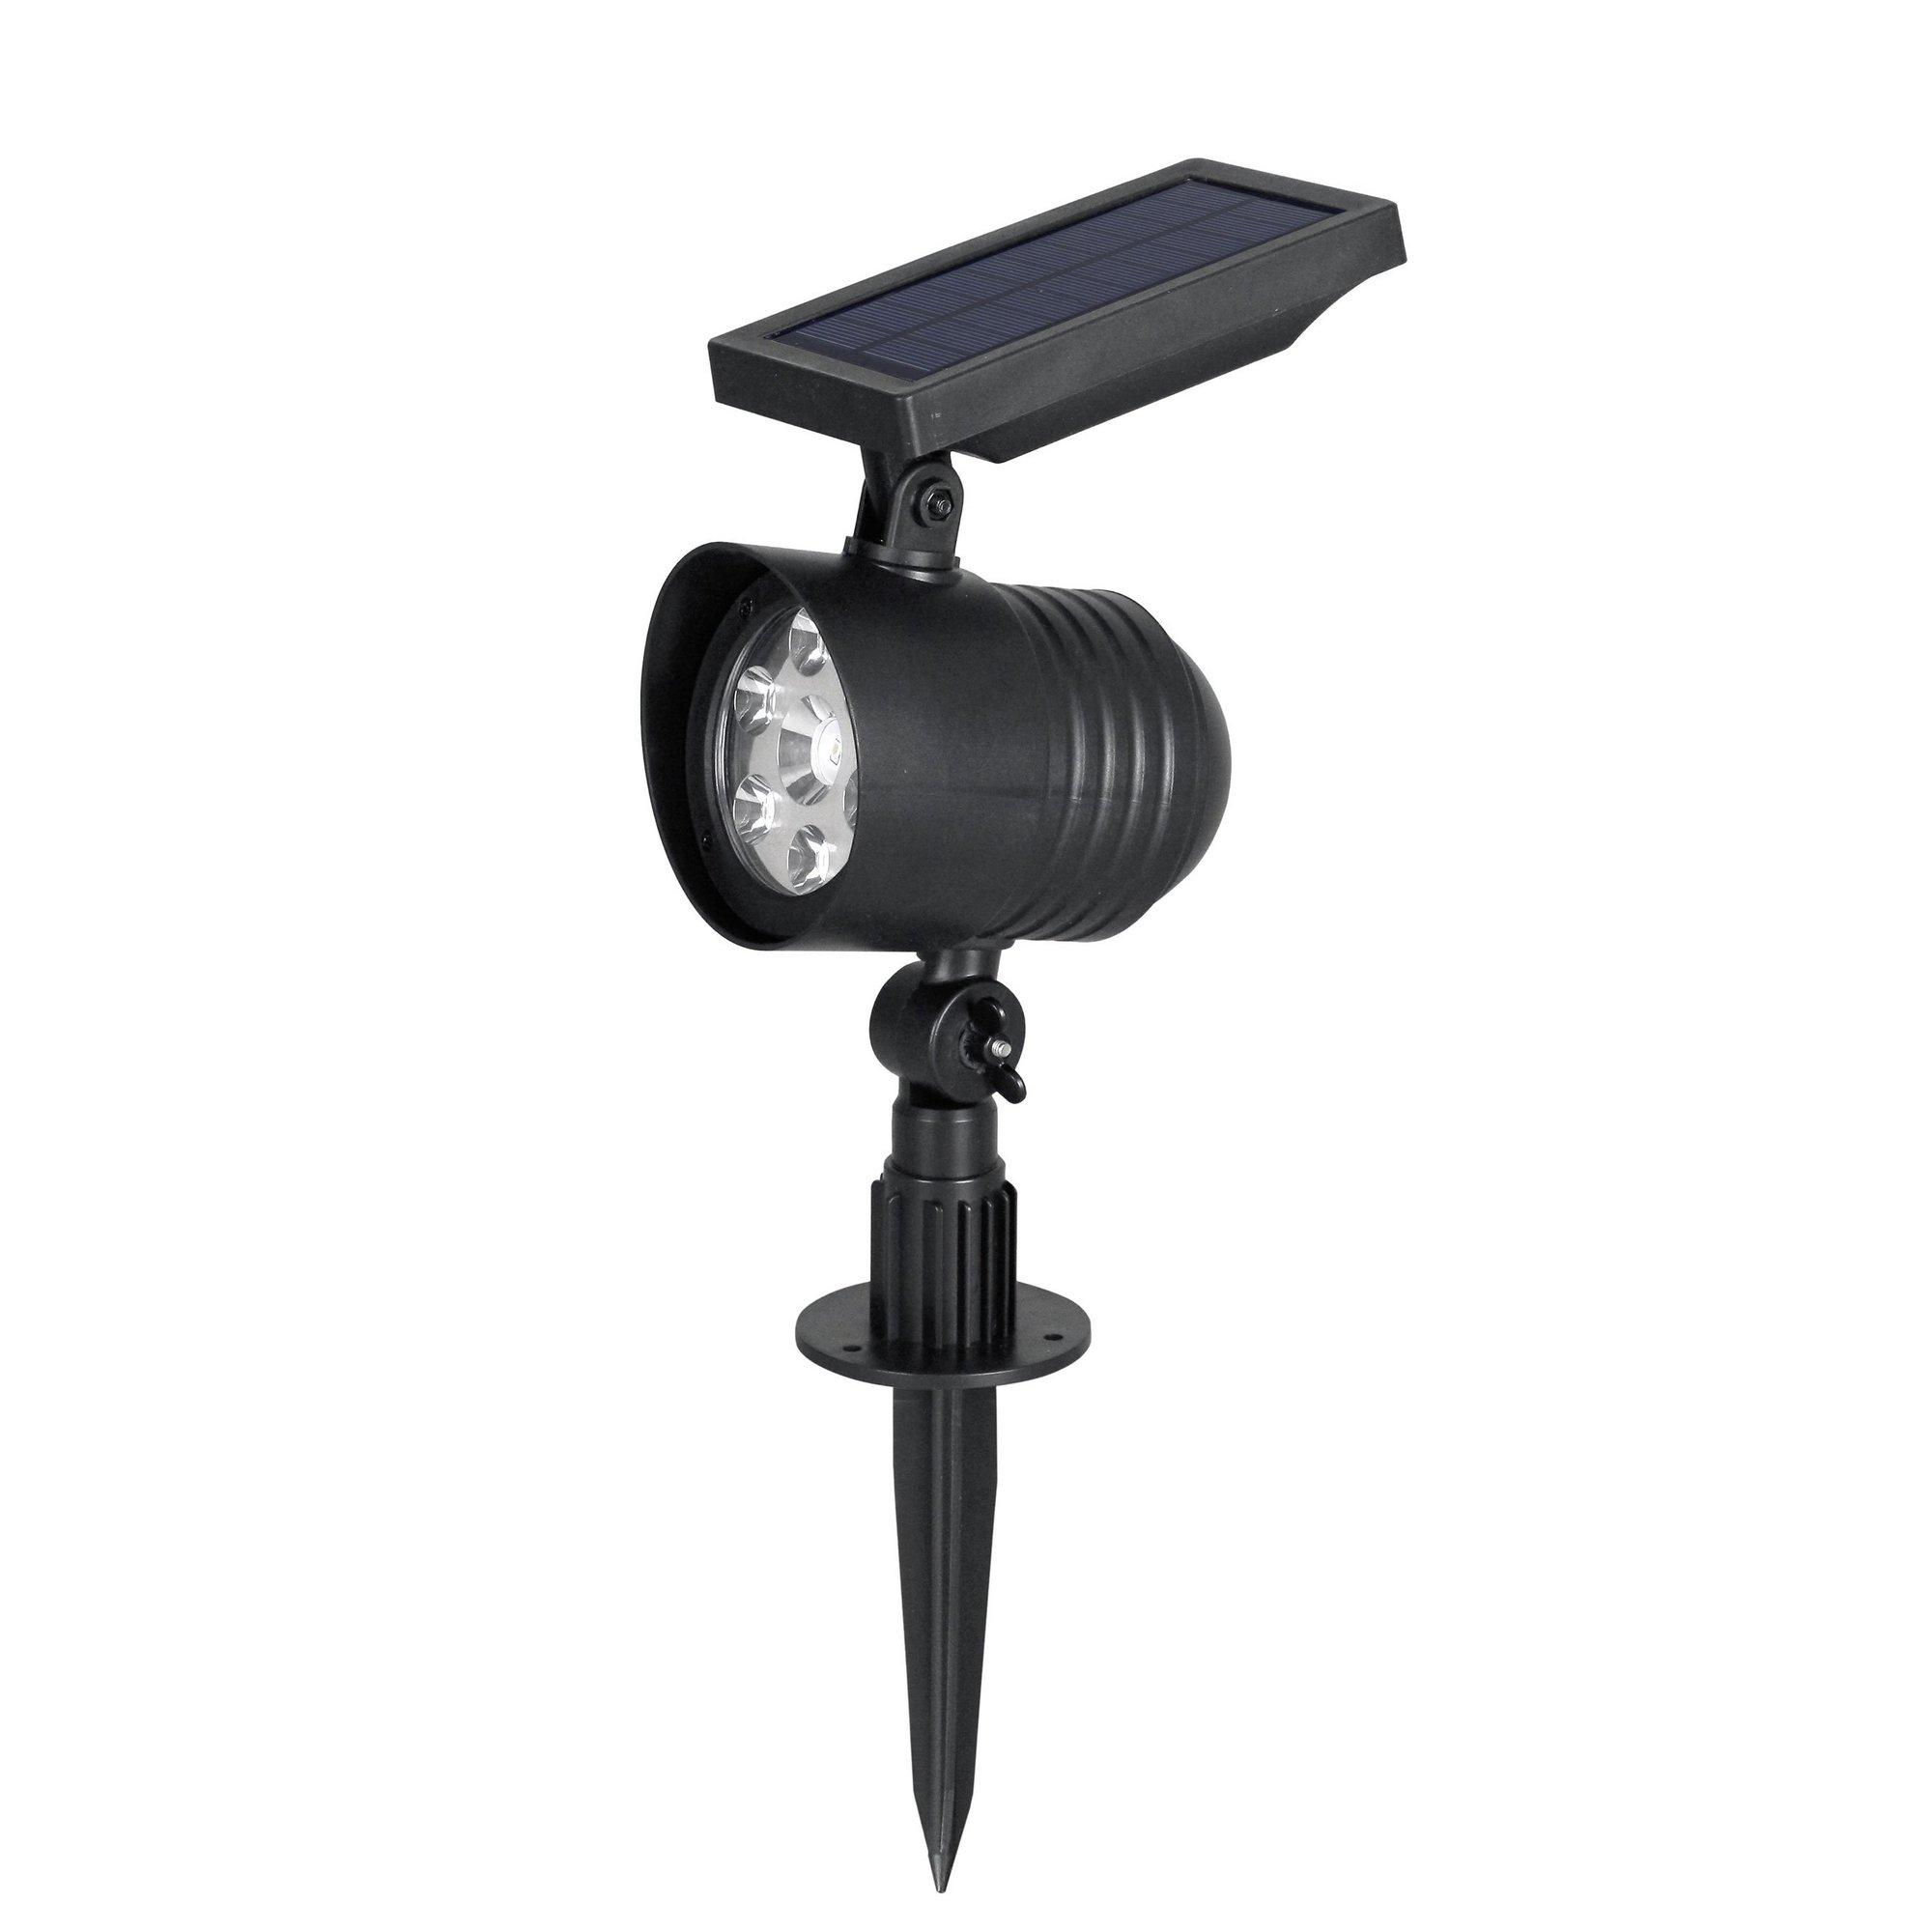 Image of Lupus Intelligent Solar LED 50 Lumen Spotlight